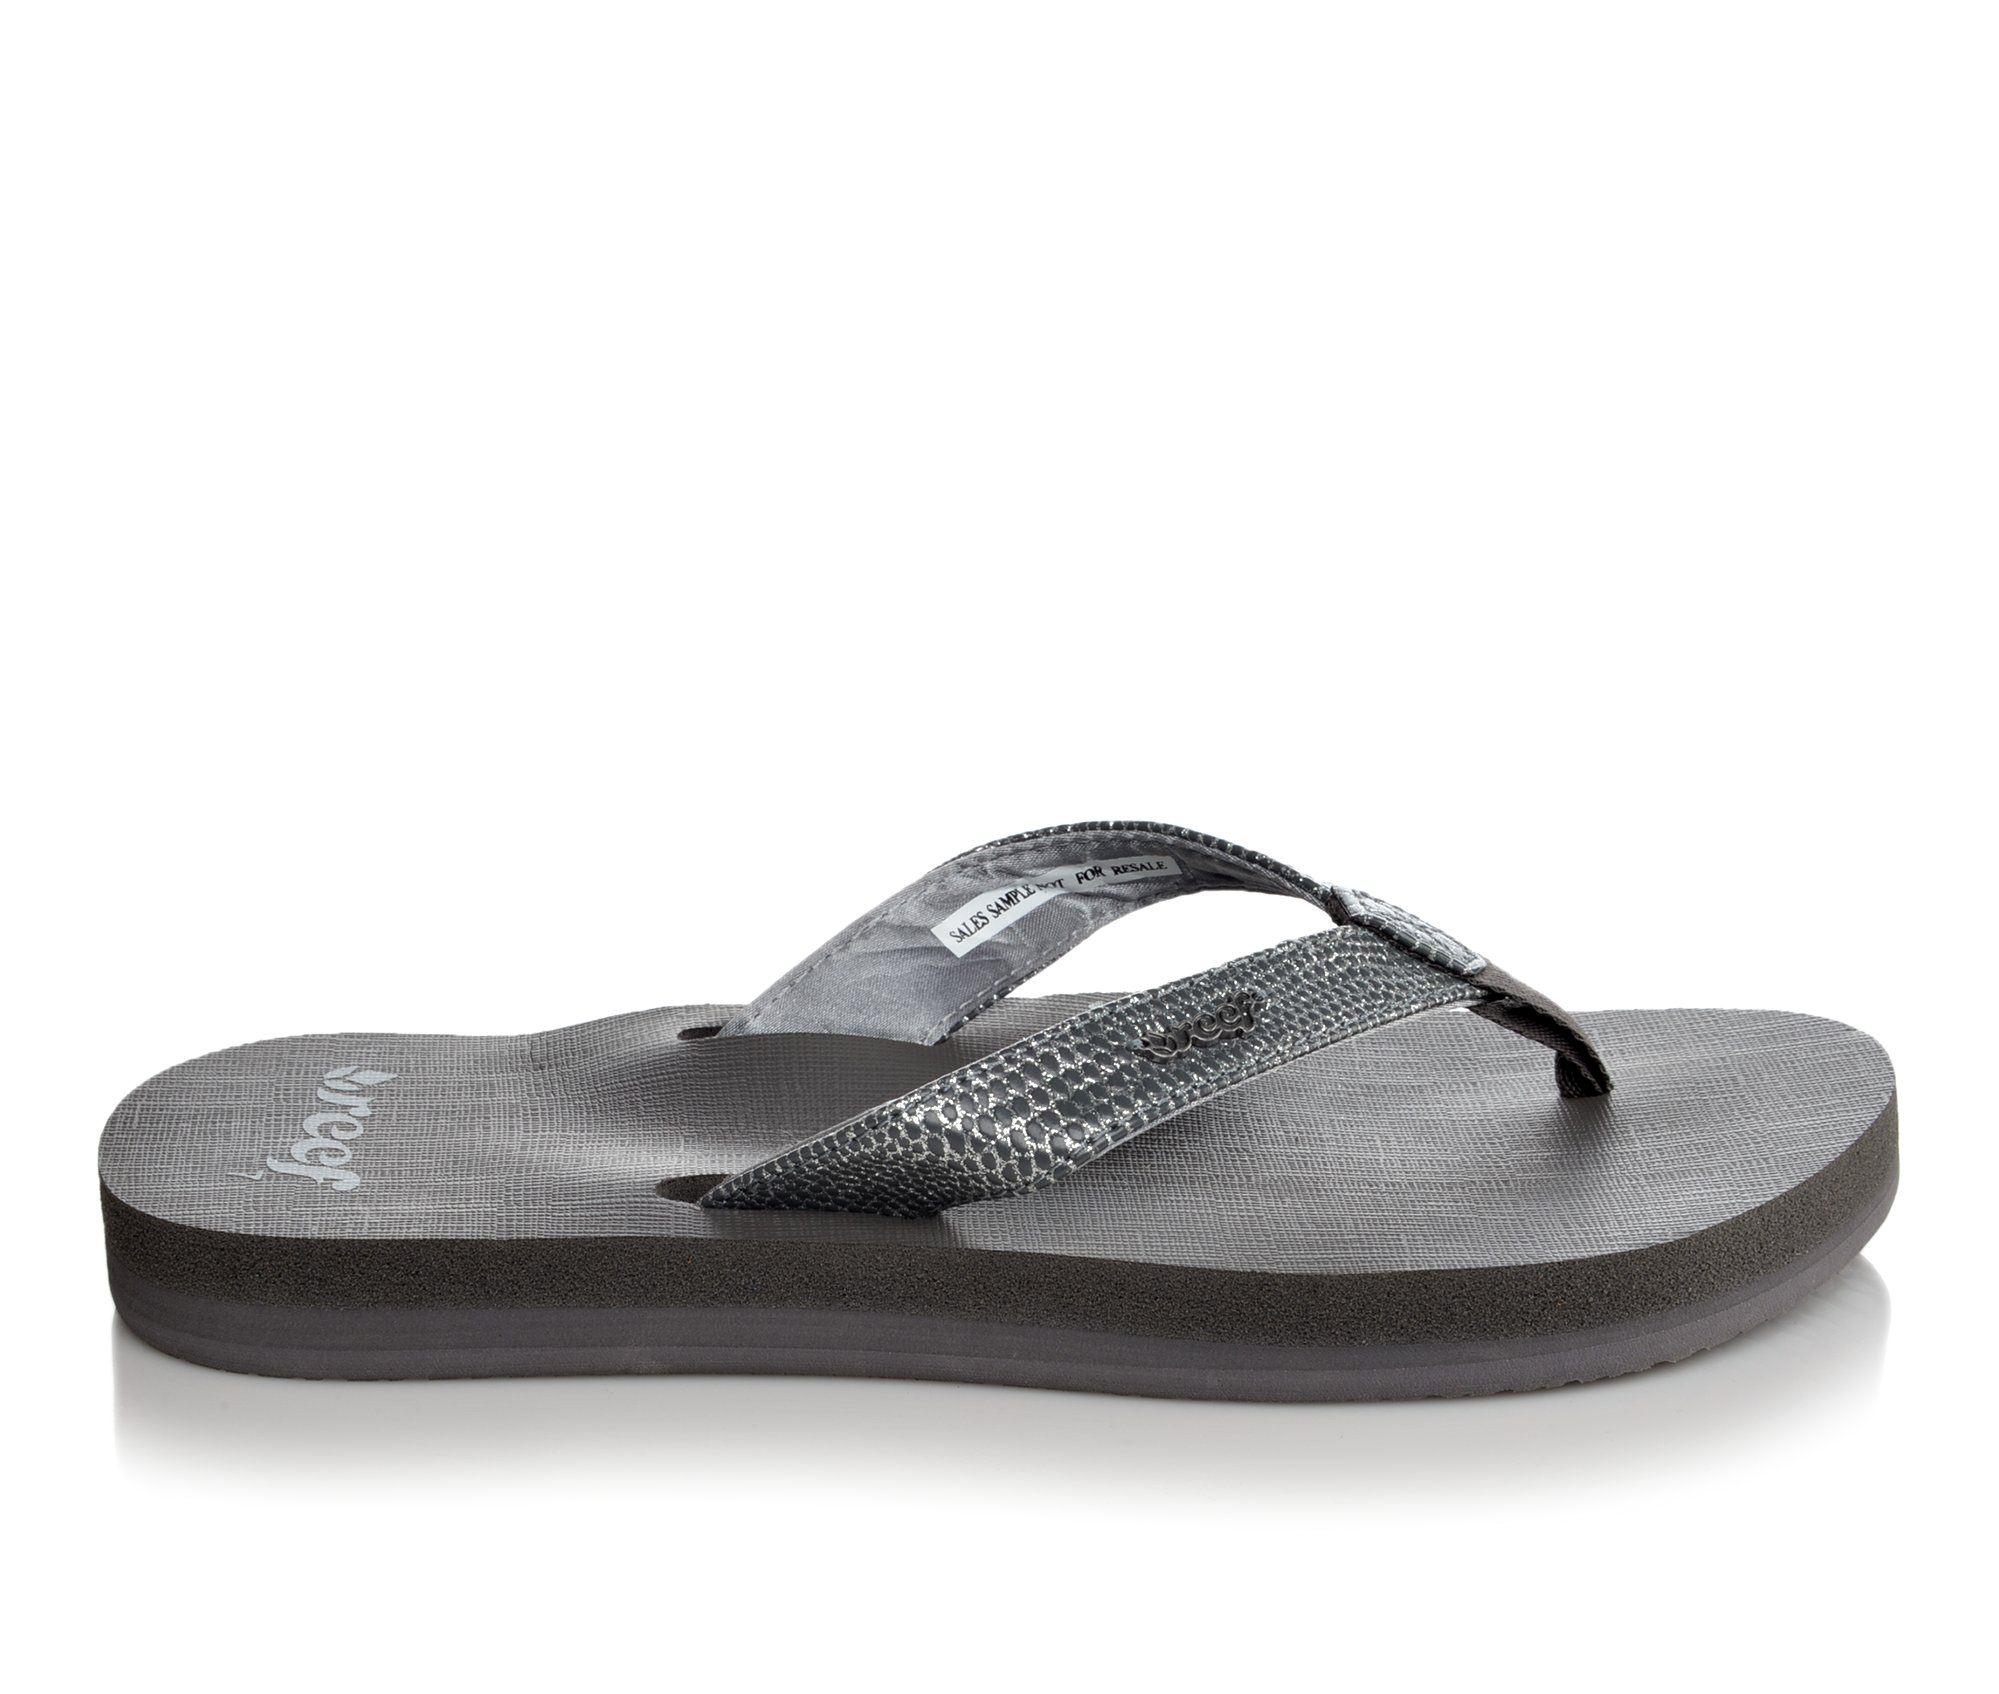 Women's Reef Sassy Star Sandals (Silver)